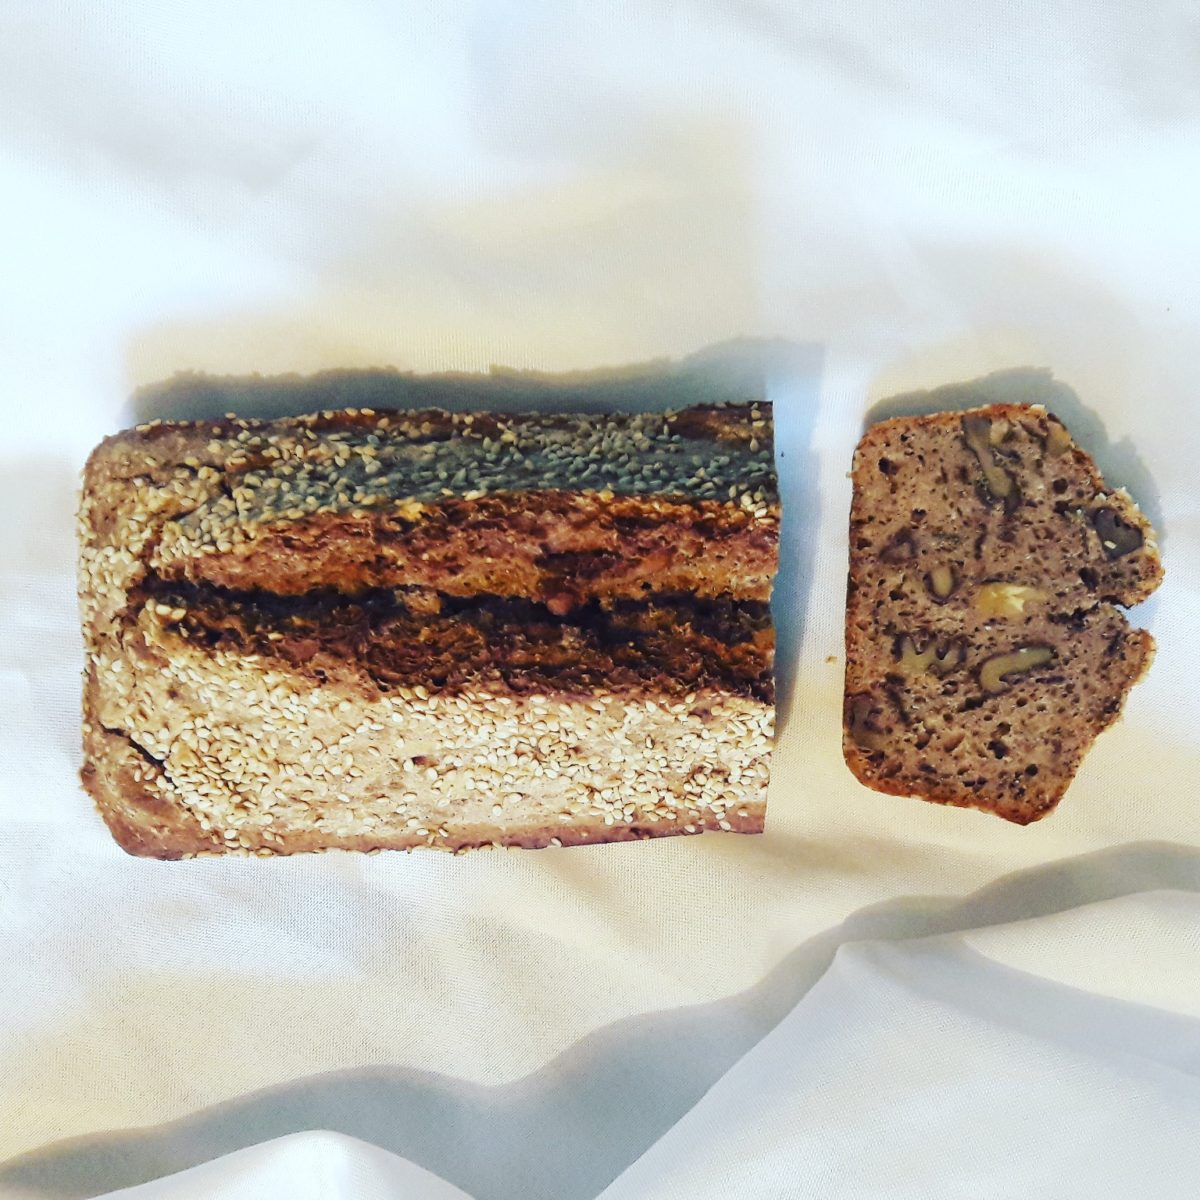 Rezept: Dinkel-Buchweizen-Chia-Walnuss-Sesam-Brot